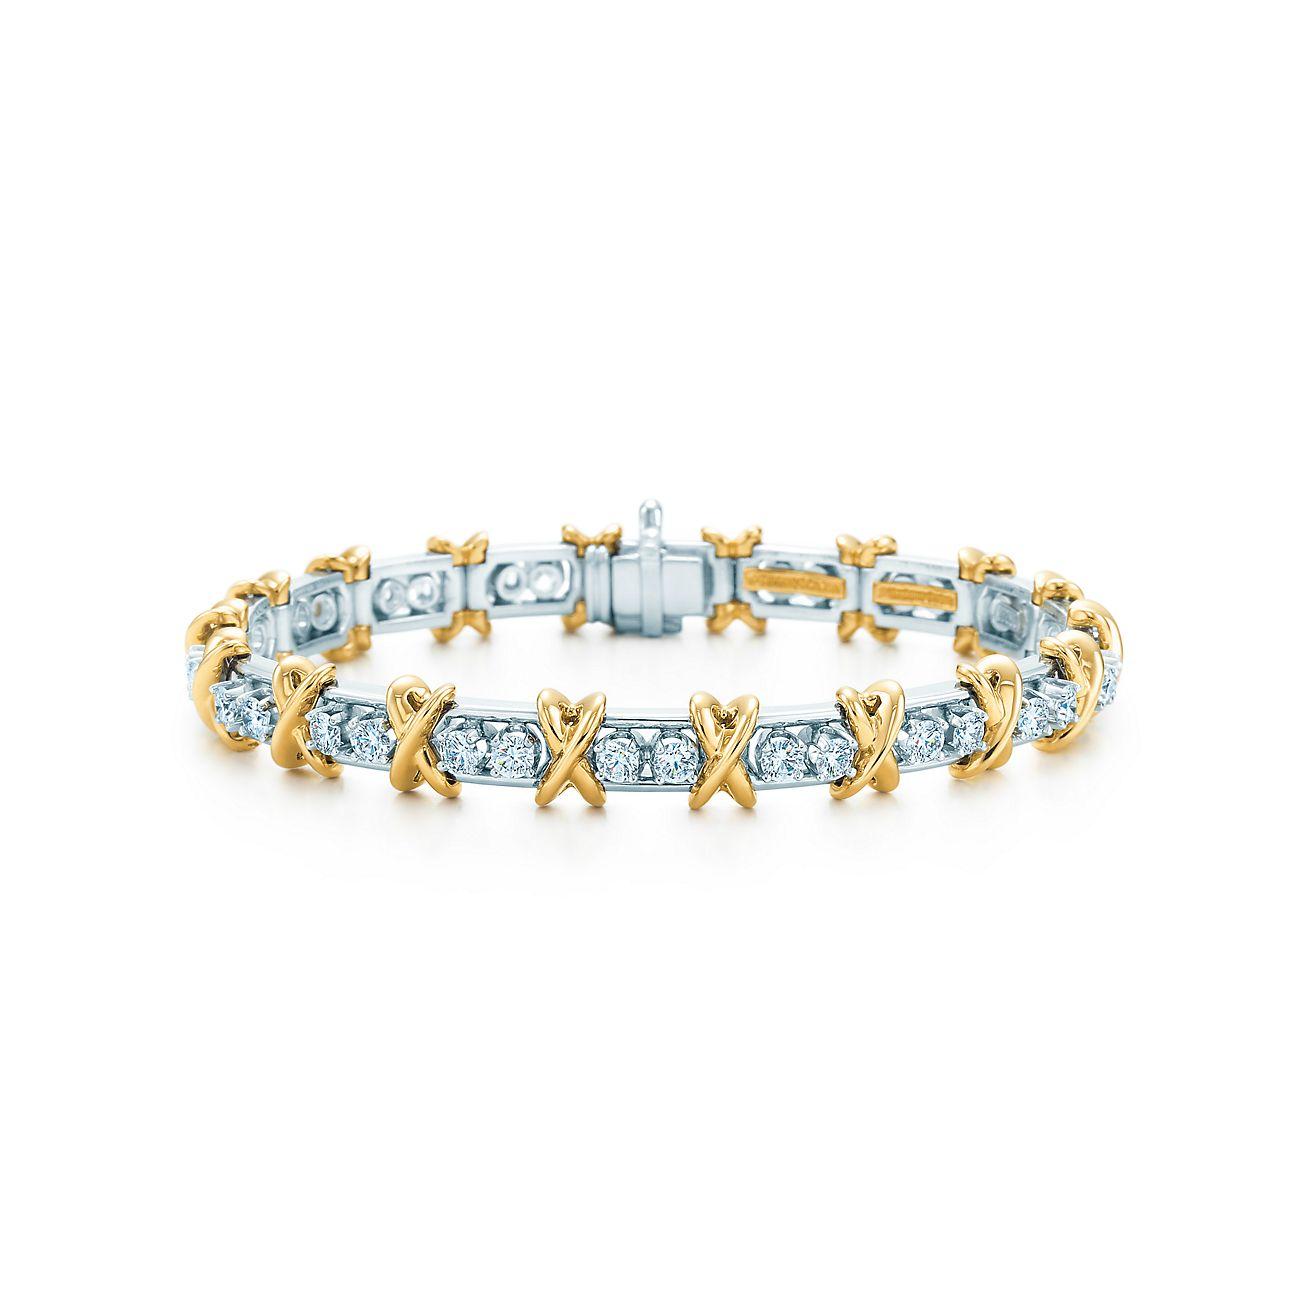 Tiffany Co Schlumberger 36 Stone Bracelet In 18k Gold With Diamonds Tiffany Co